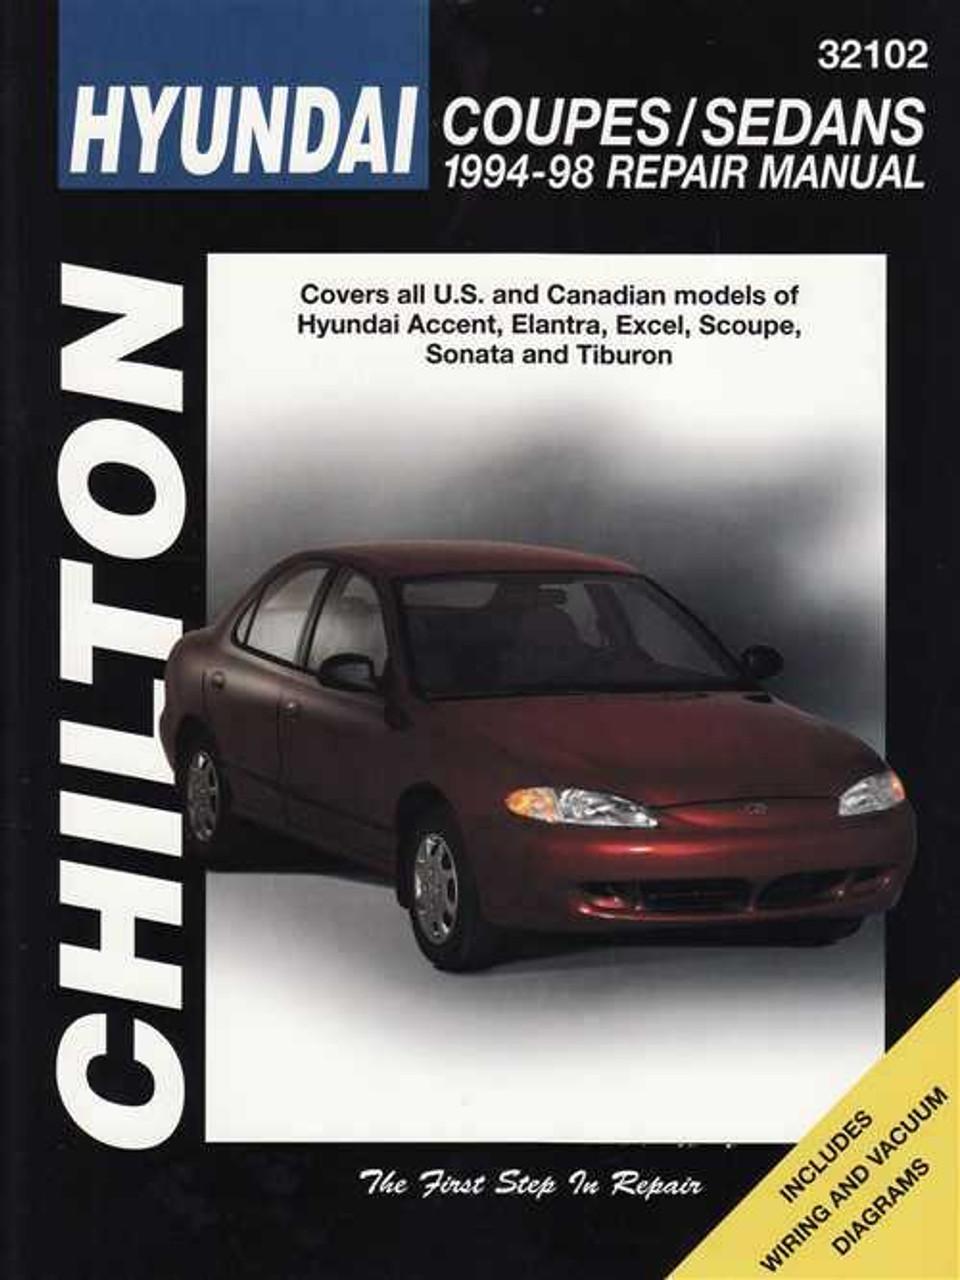 hyundai accent, elantra, excel, scoupe, sonata 1994 - 1998 workshop manual